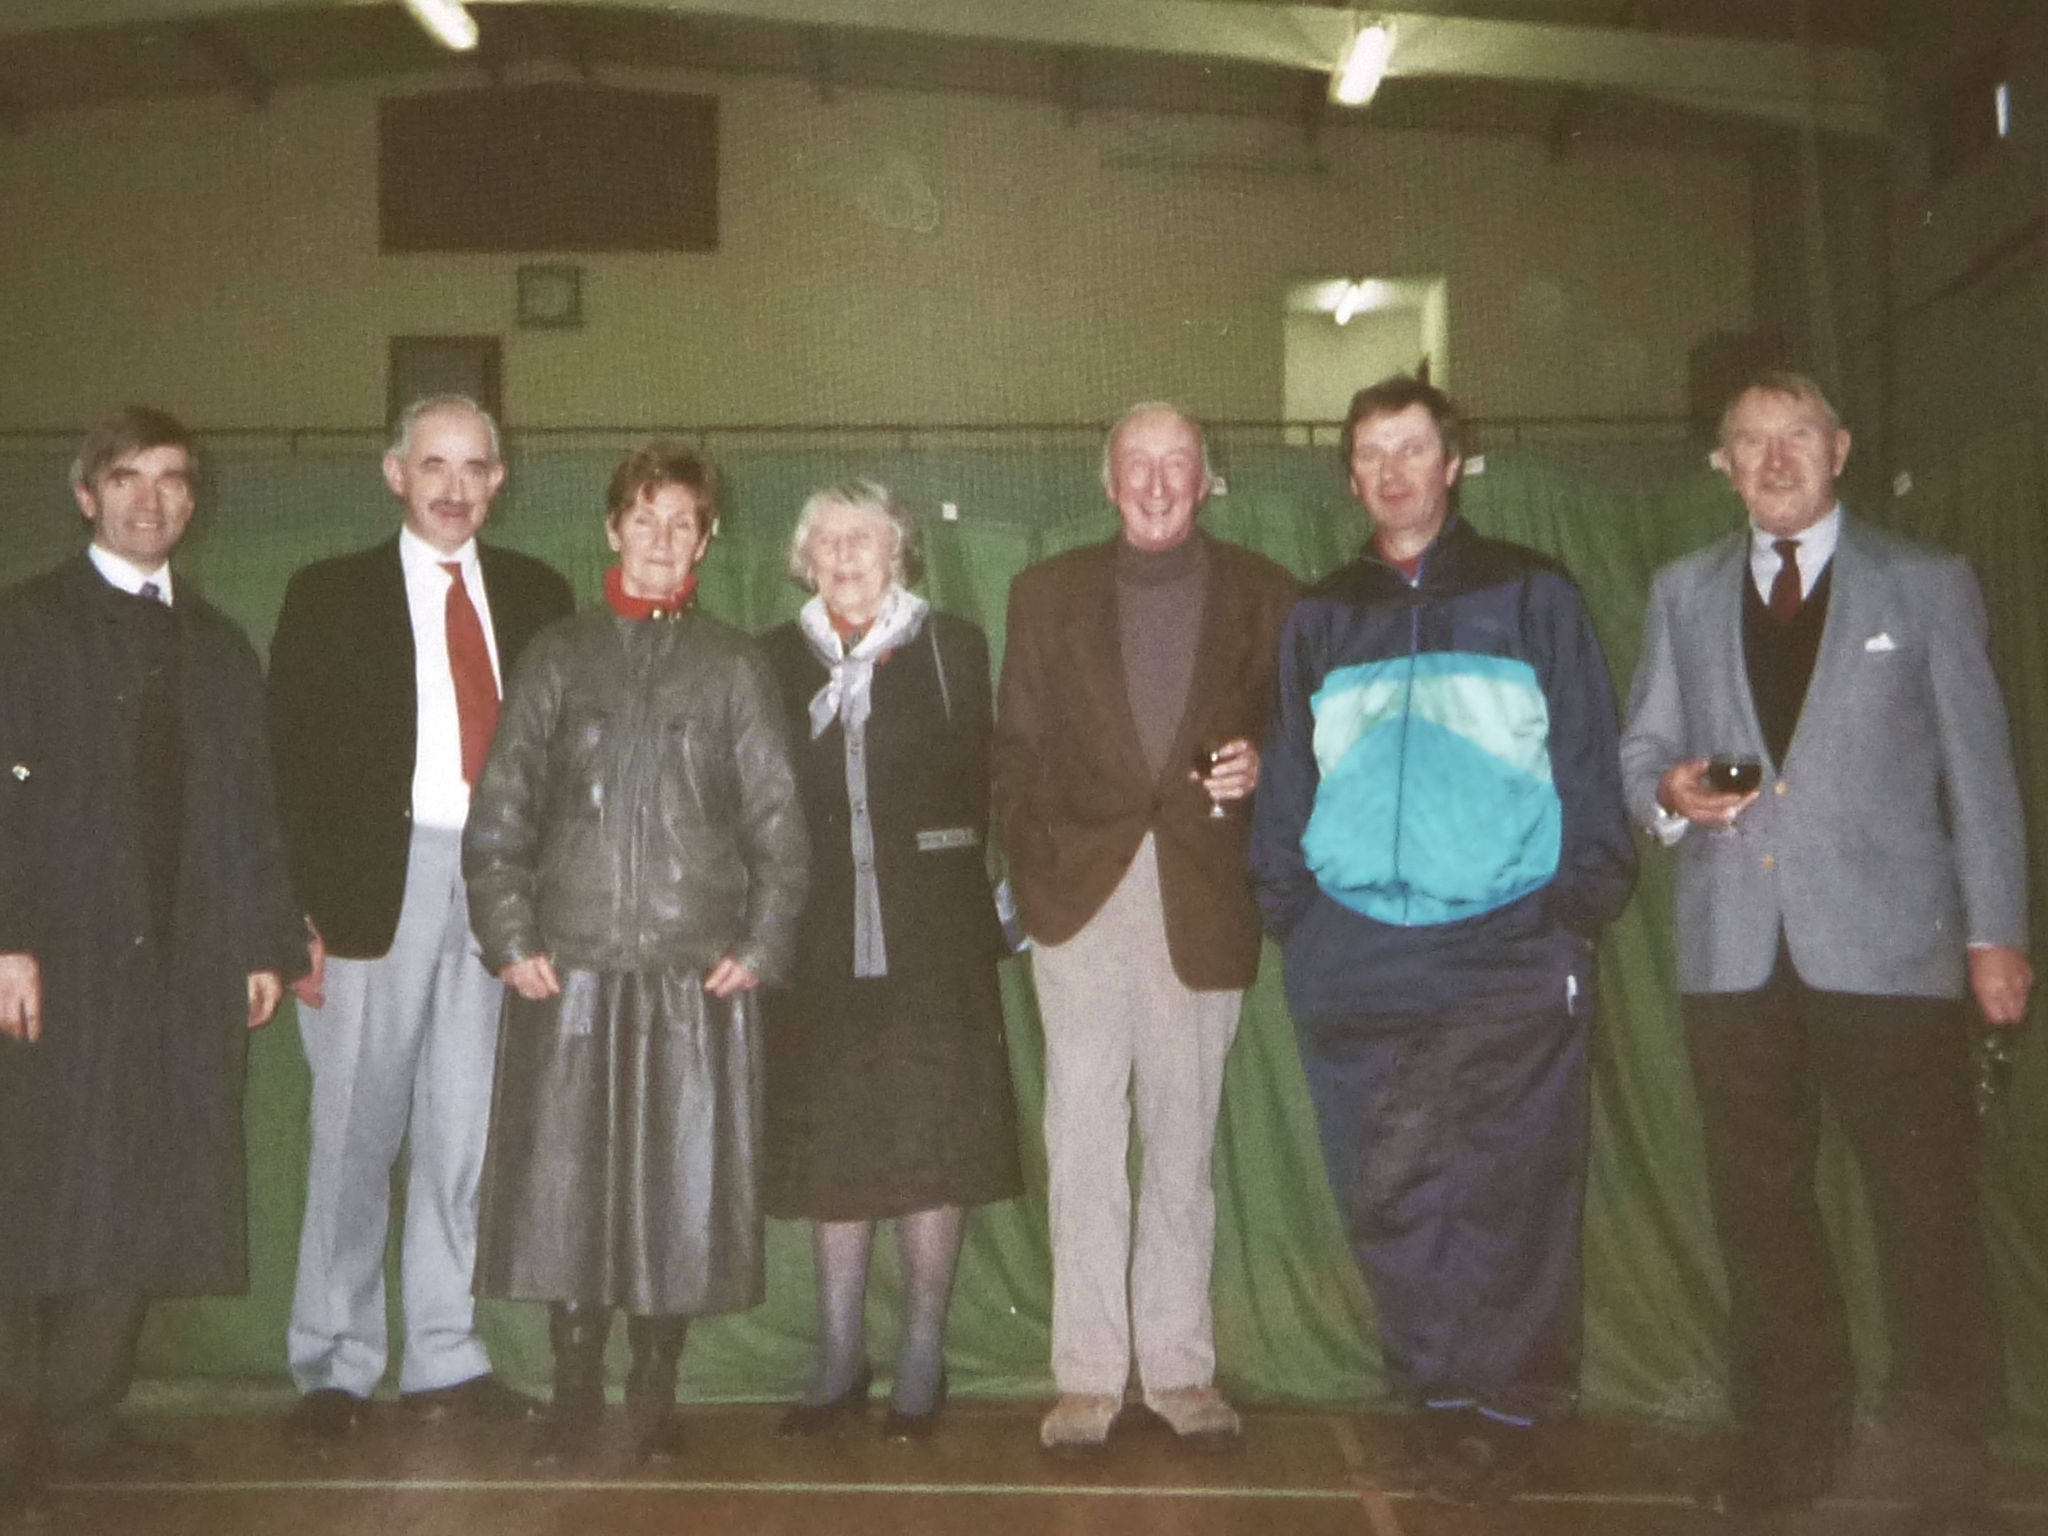 Seven Irish Olympians F. Farrell, M. Ryan, S Duffy, Tommy Dermody, H. Thuillier, J. Bouchier-Hayes, & G. Carpenter.